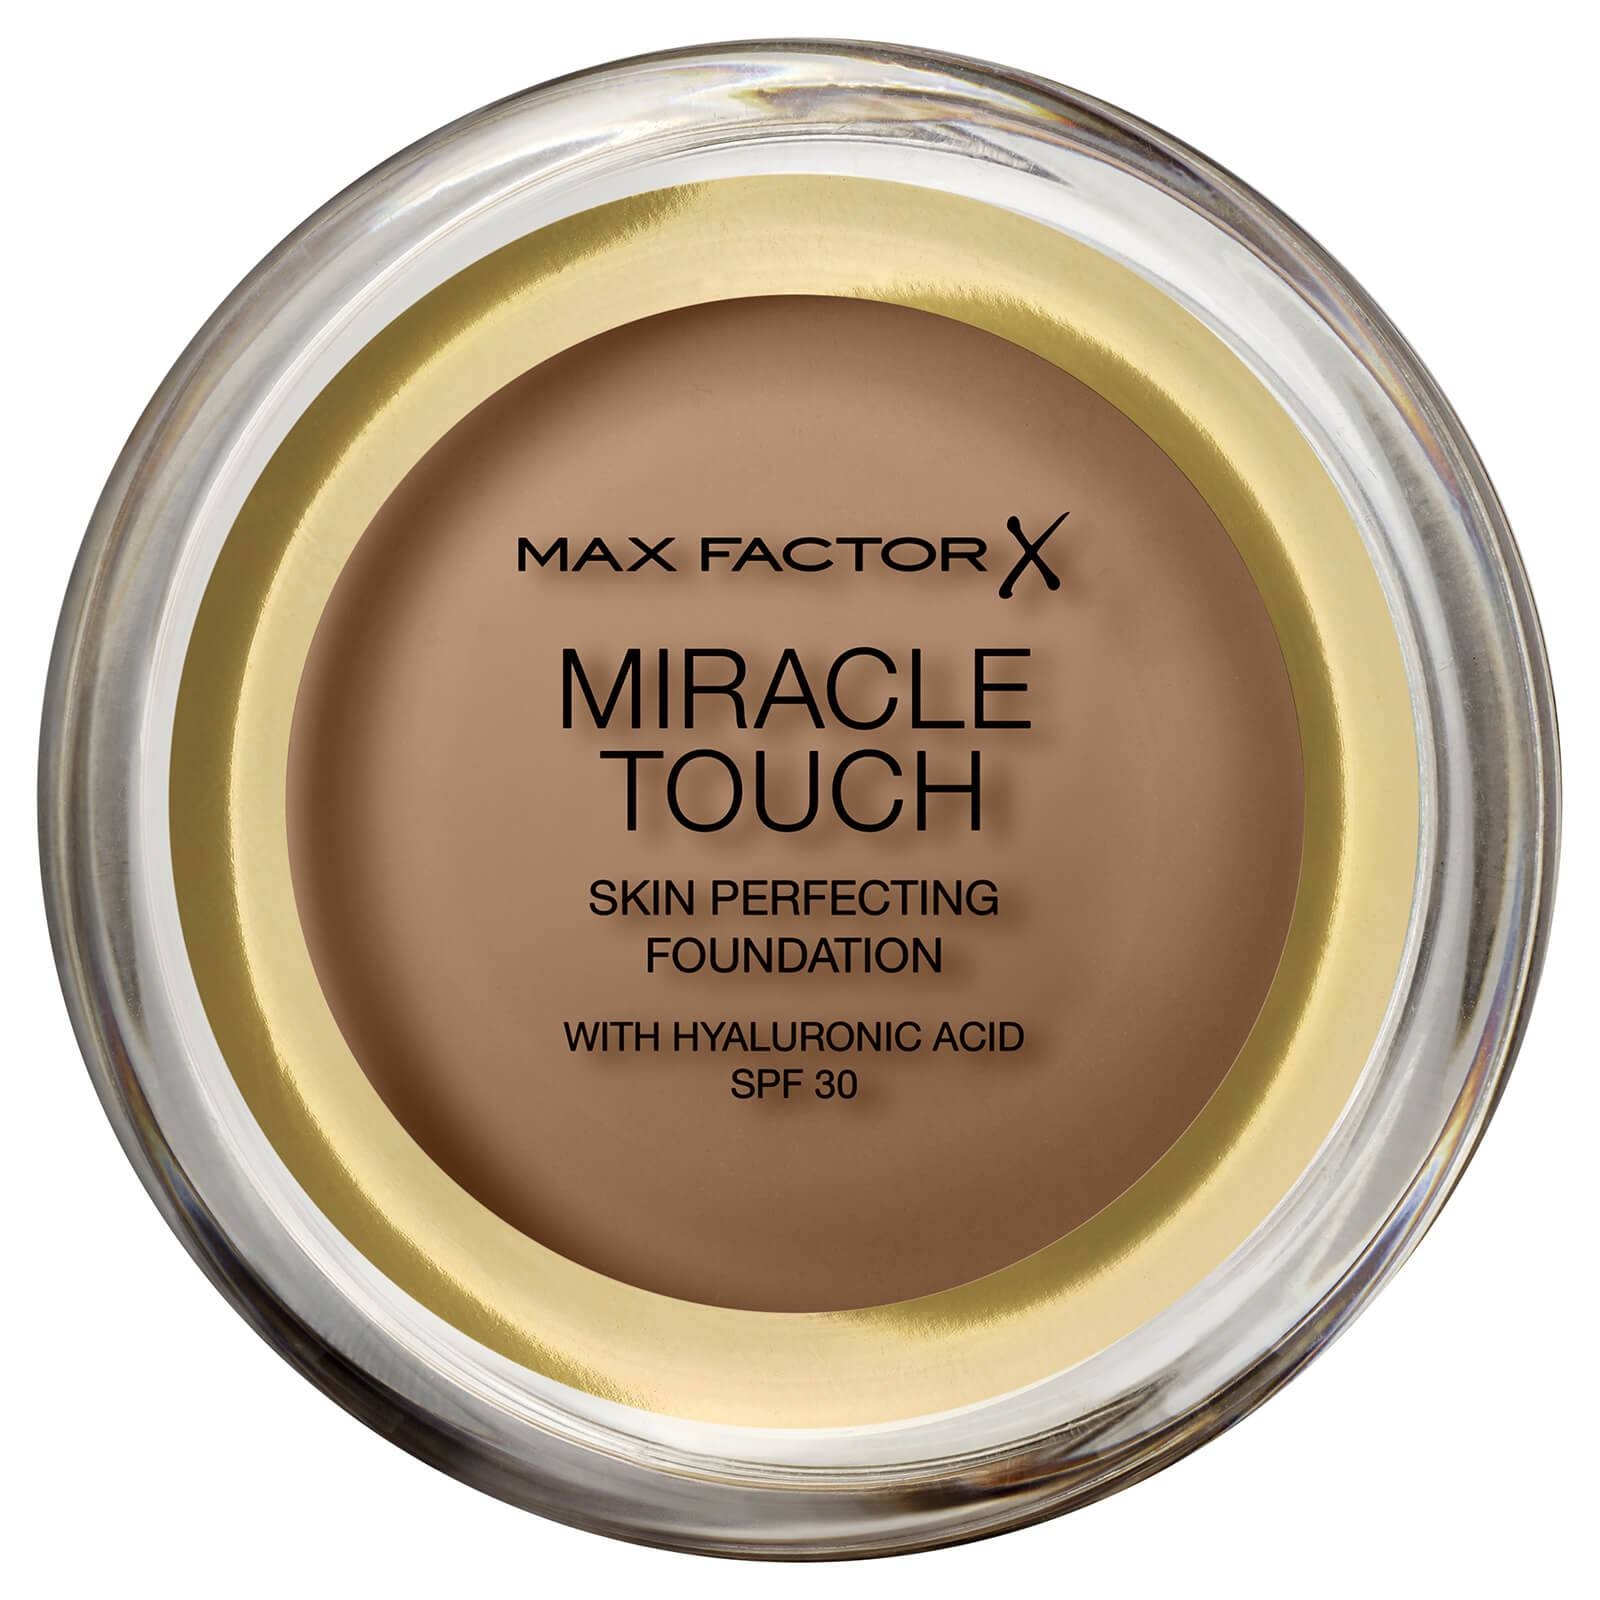 Max Factor Base Miracle Touch de  (varios tonos) - Toasted Almond